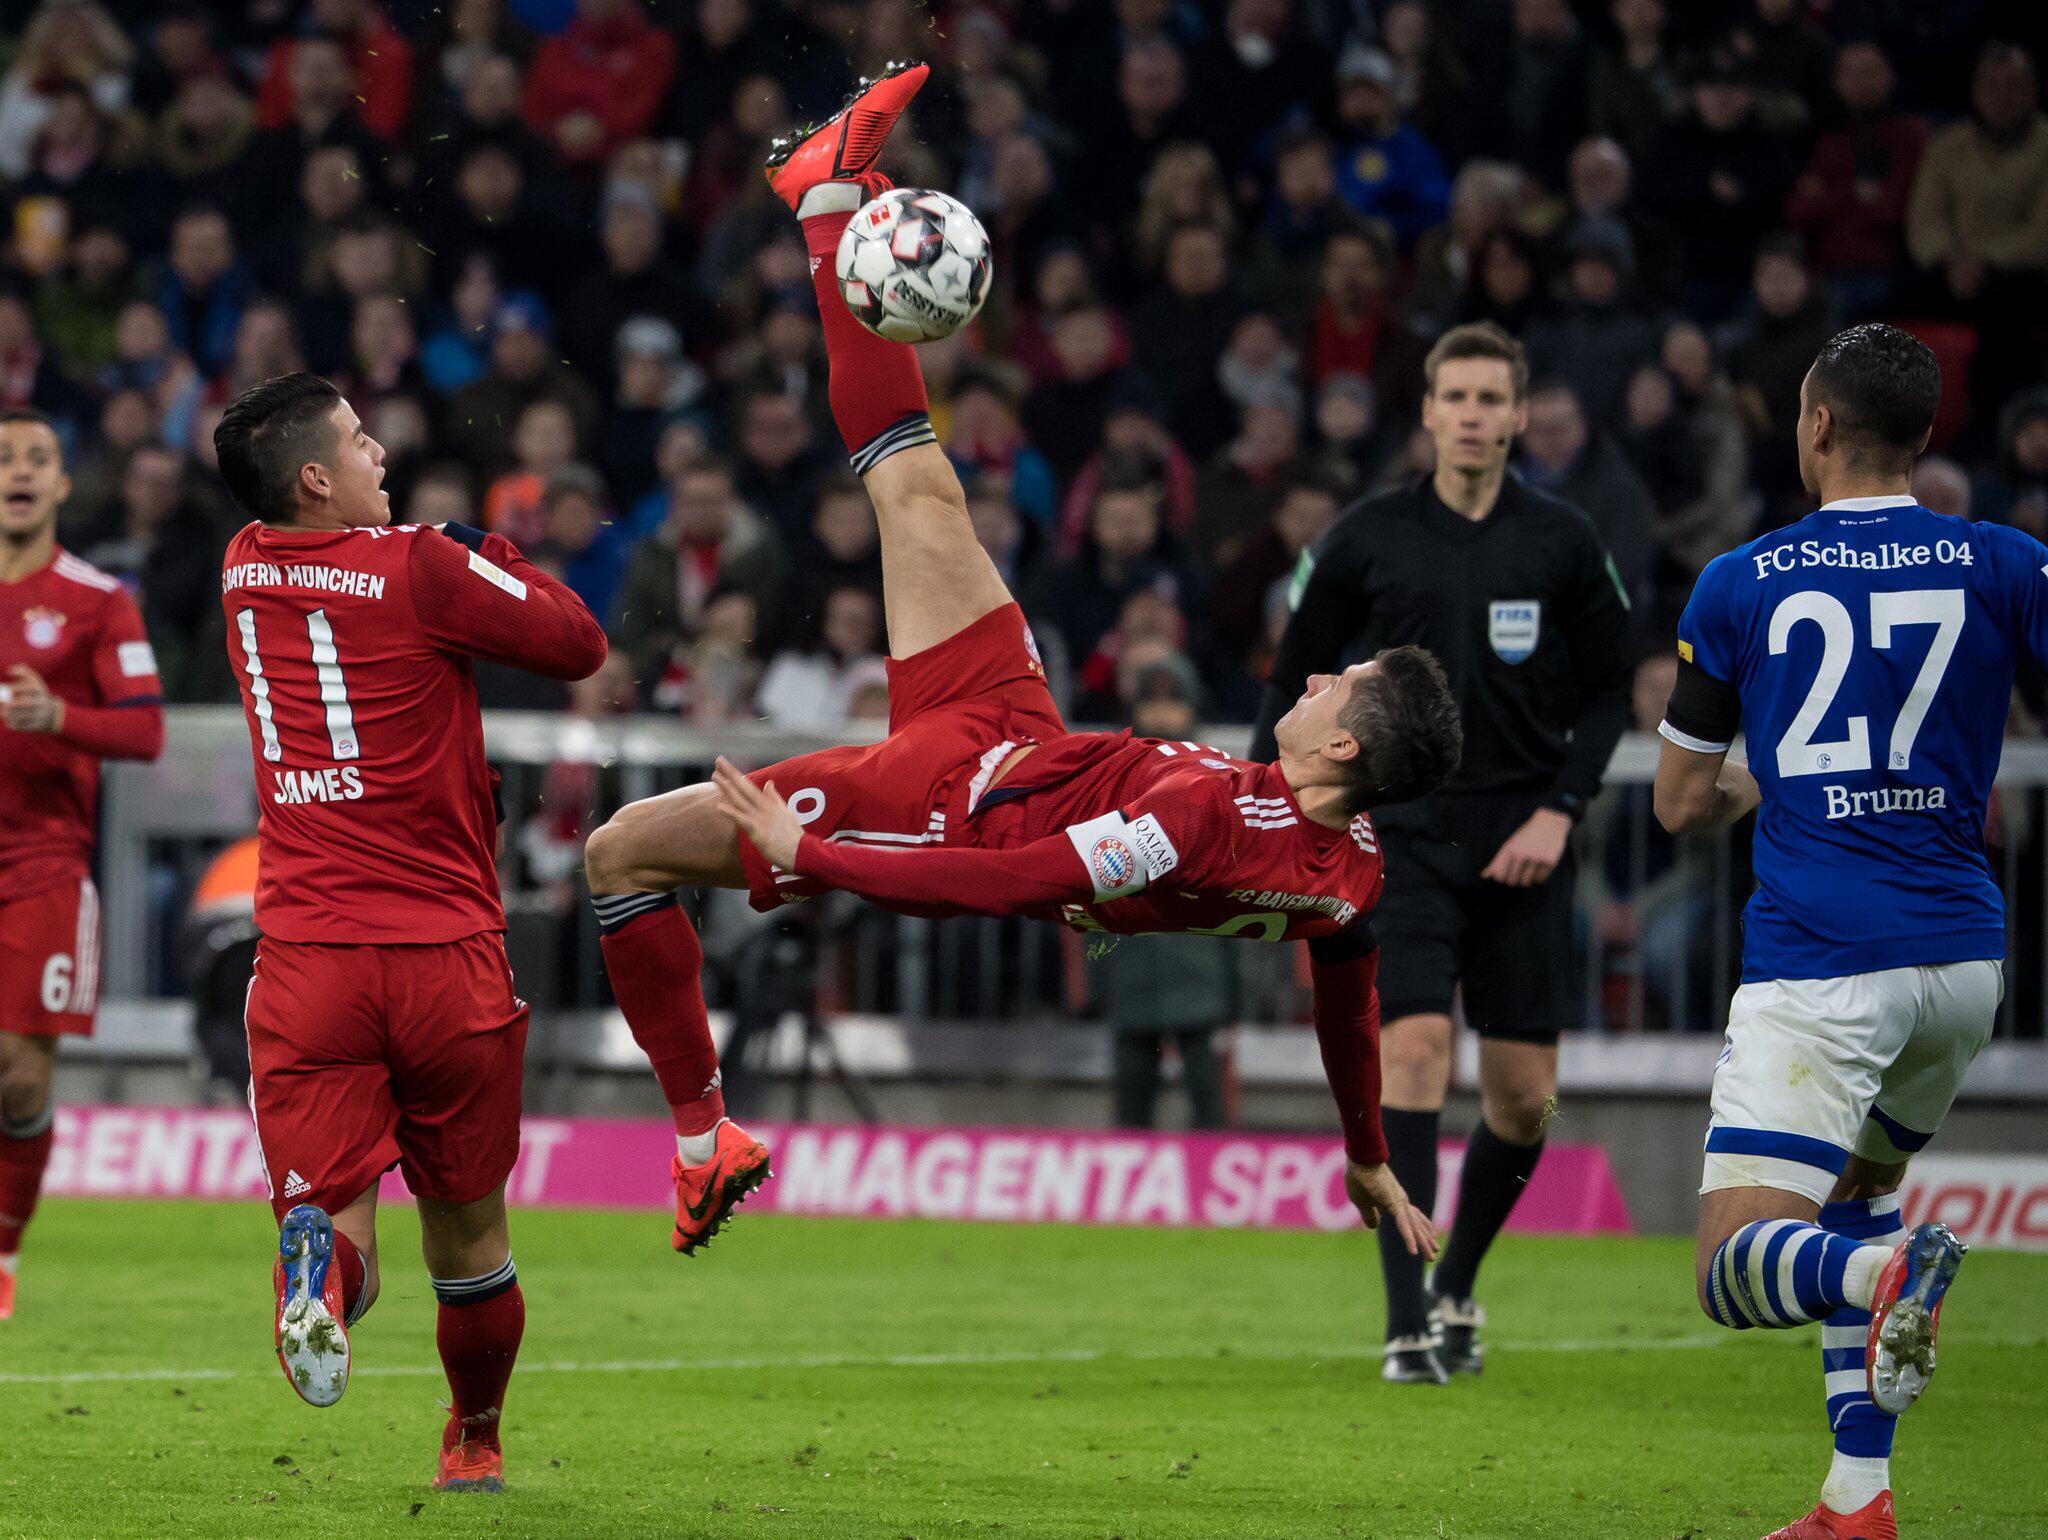 Bild zu Bayern München, FC Schalke 04, Robert Lewandowski, Fallrückzieher, James, Jeffrey Bruma